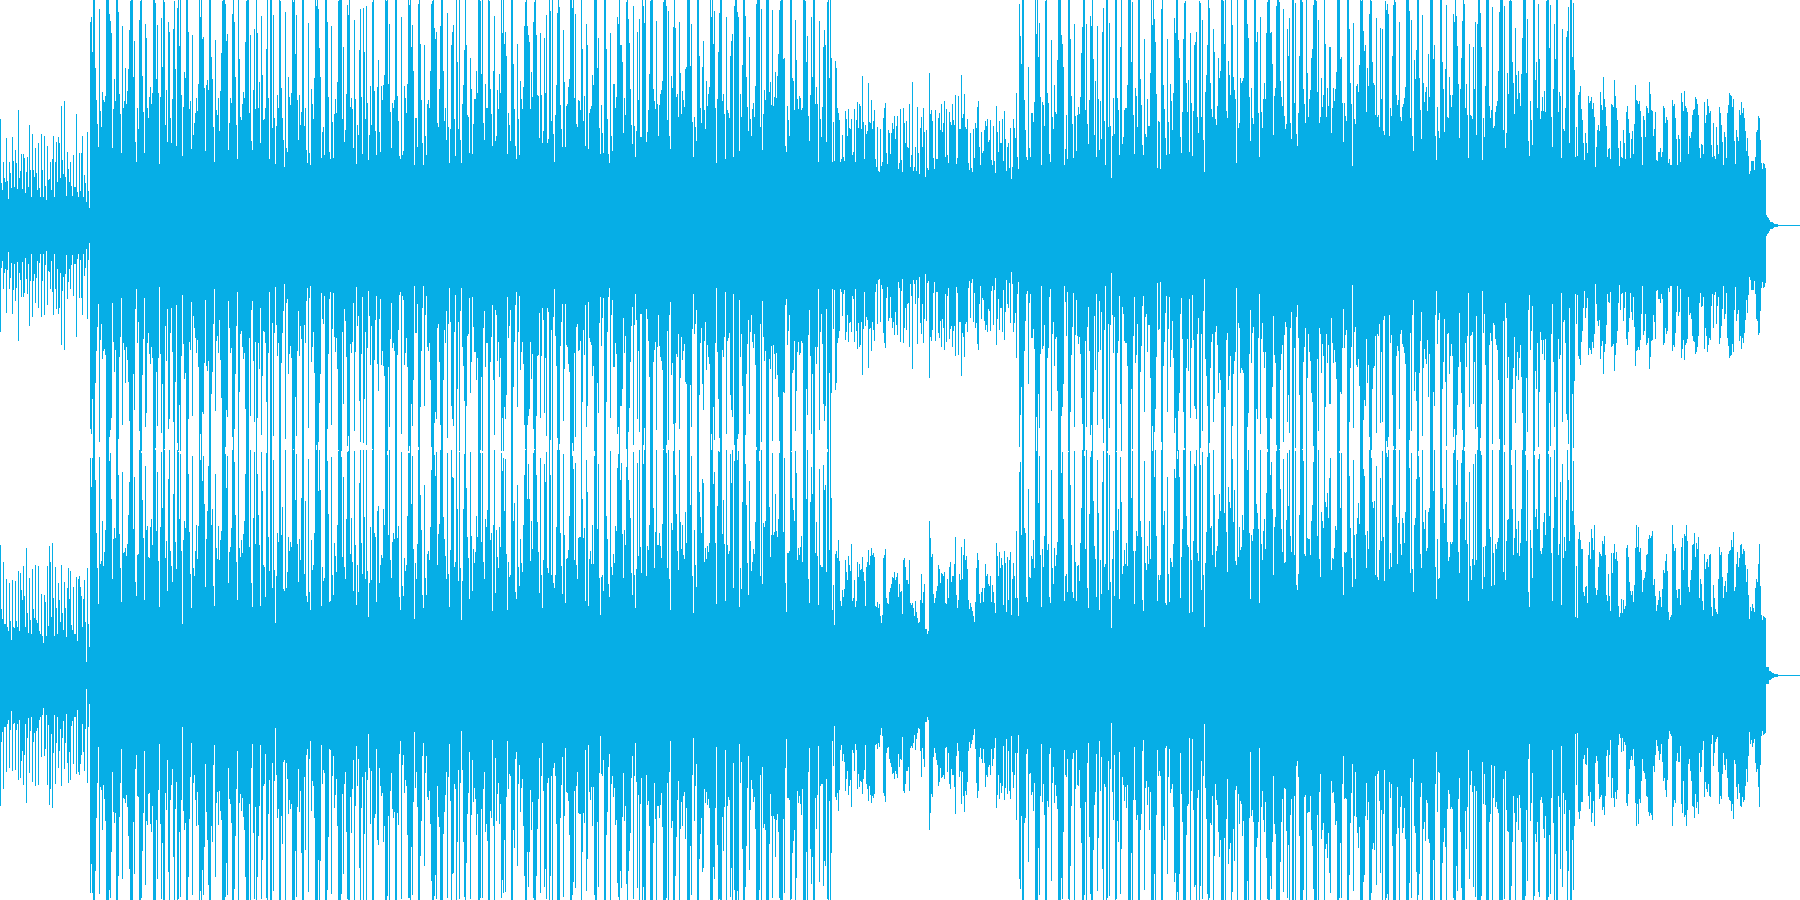 EDMを取り入れたアメリカンポップス風の再生済みの波形